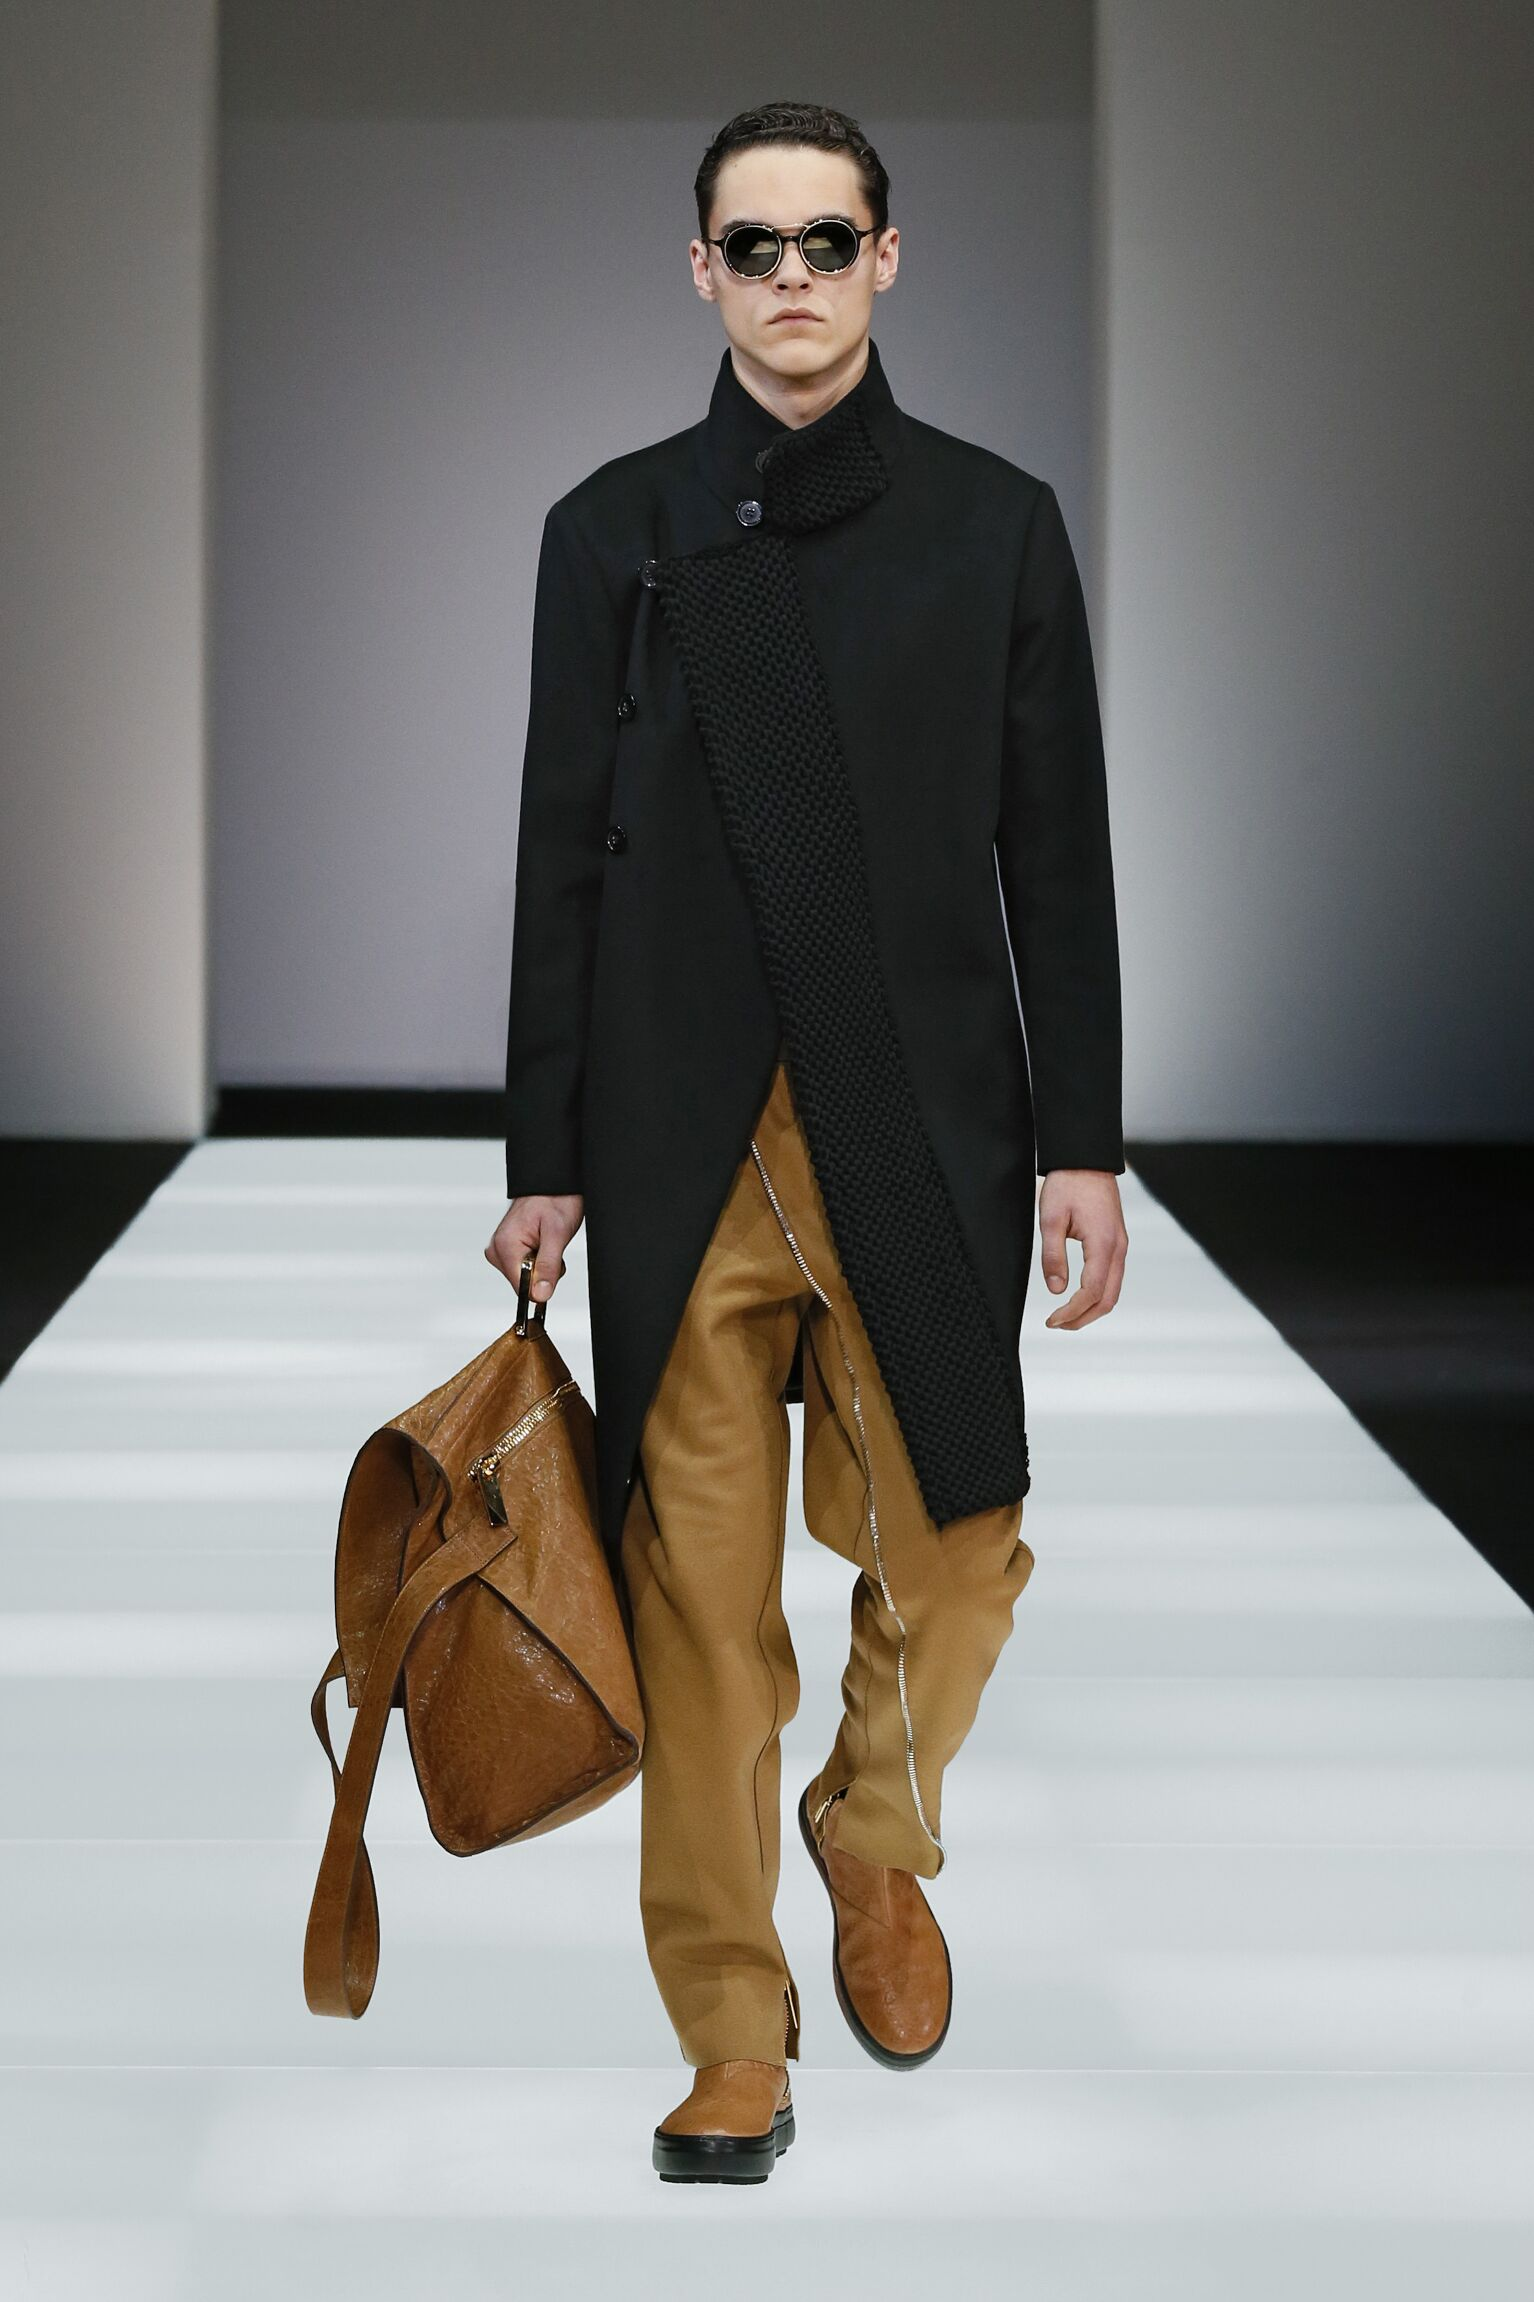 Emporio Armani Fall Winter 2015 16 Men's Collection Milan Fashion Week Fashion Show